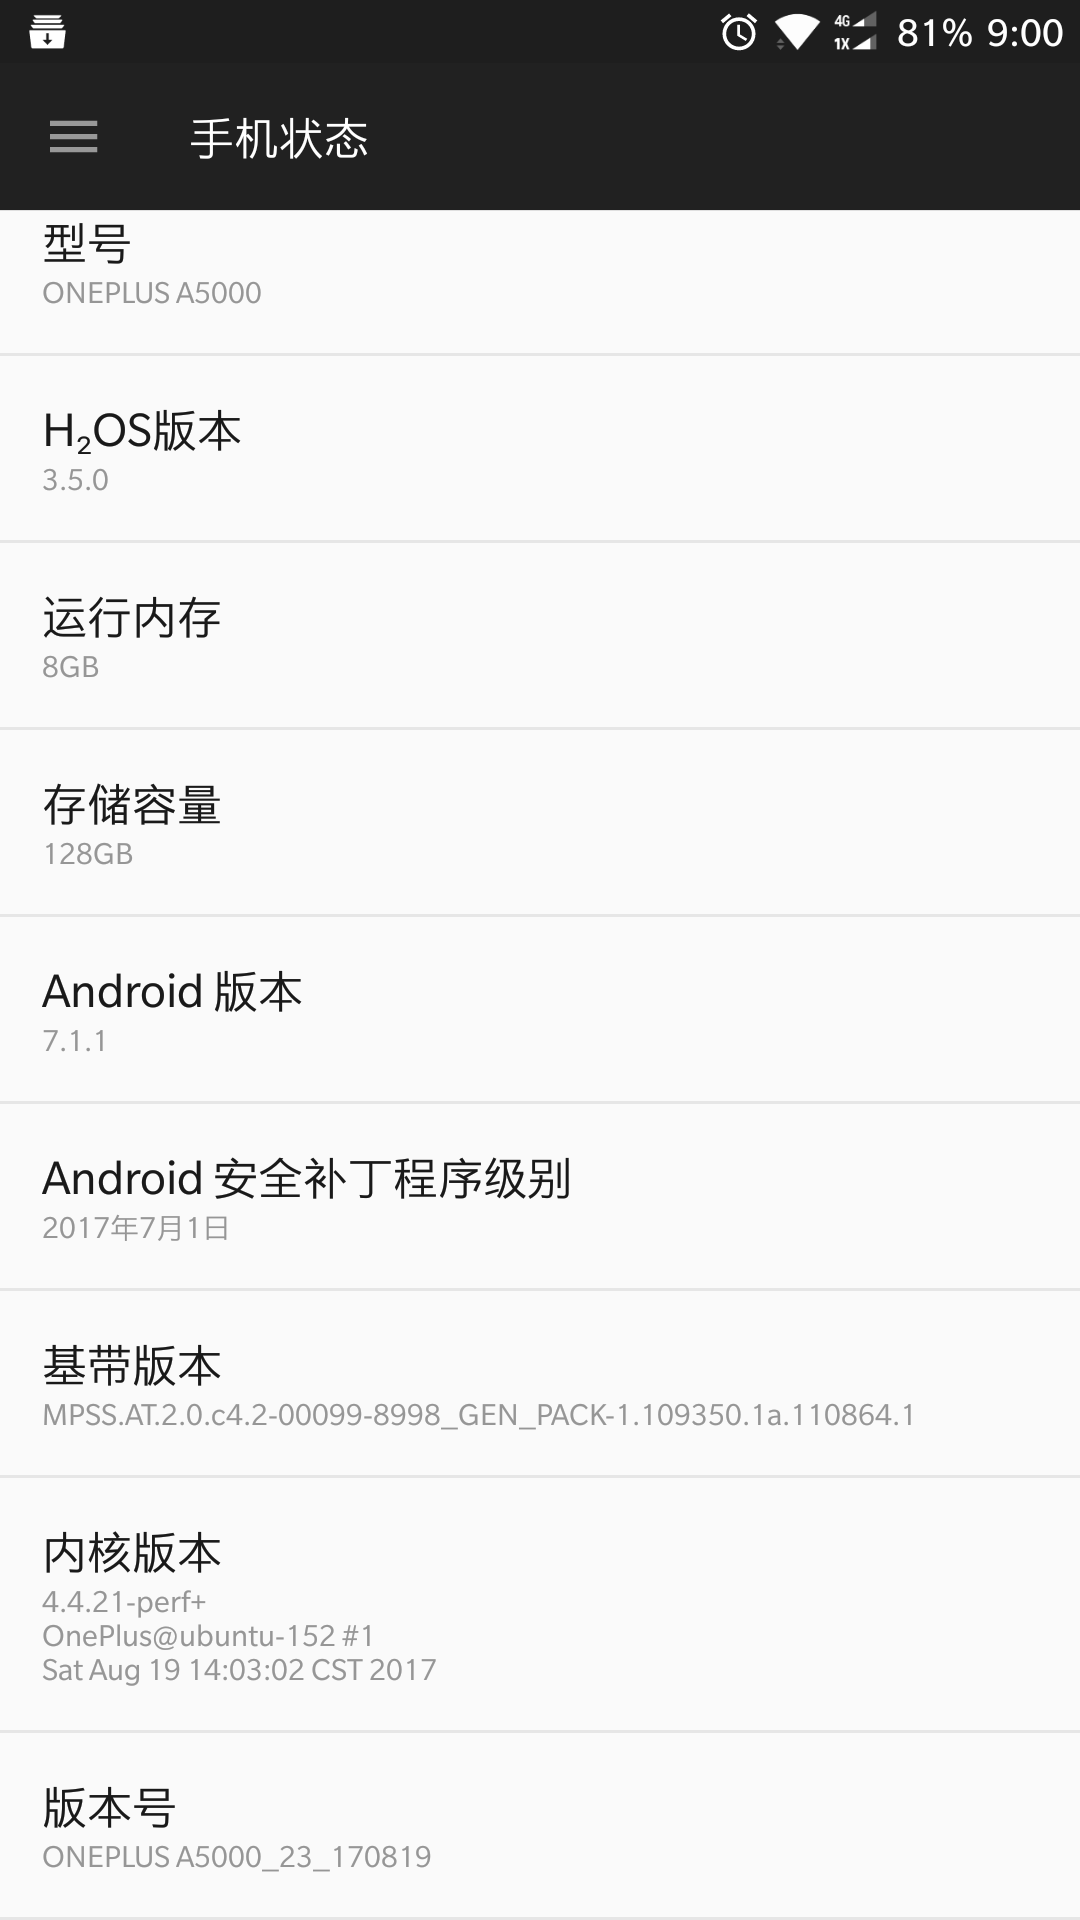 Screenshot_20170823-090023.png